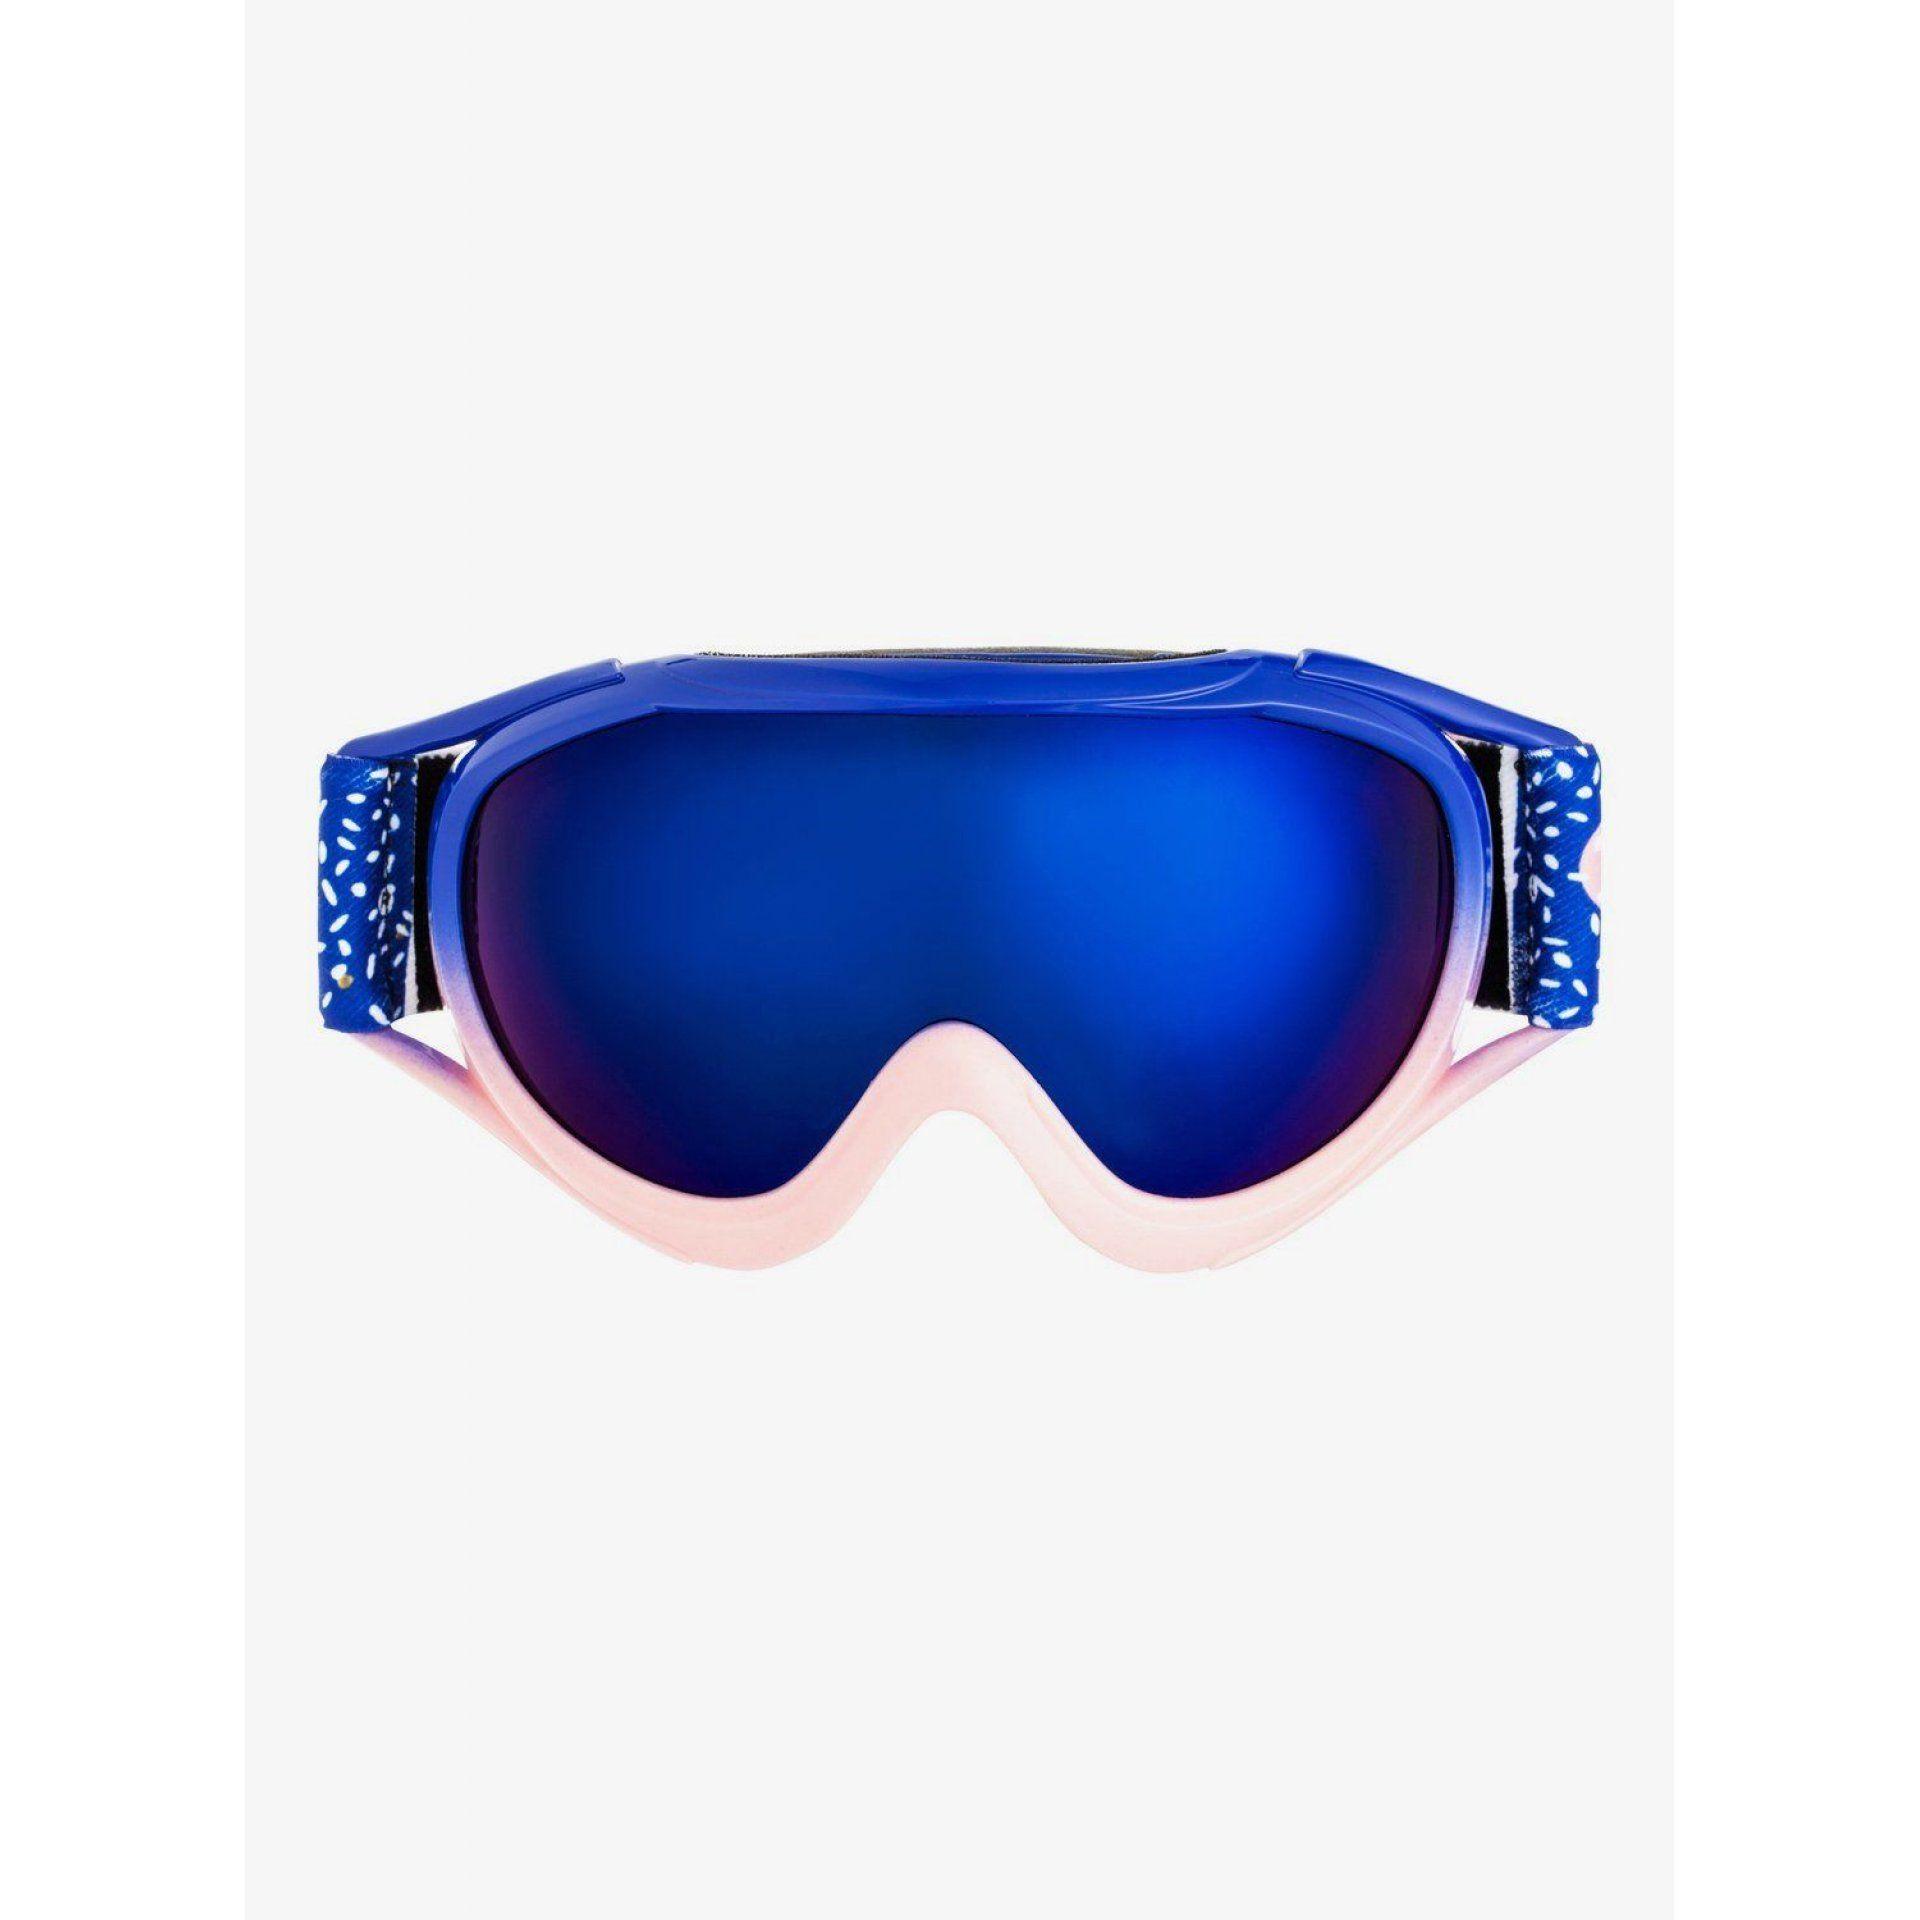 GOGLE ROXY LOOLA 2.0 2021 ERGTG03015 MAZARINE BLUE TASTY HOUR|VERMILLON ML BLUE PRR4 PRZÓD